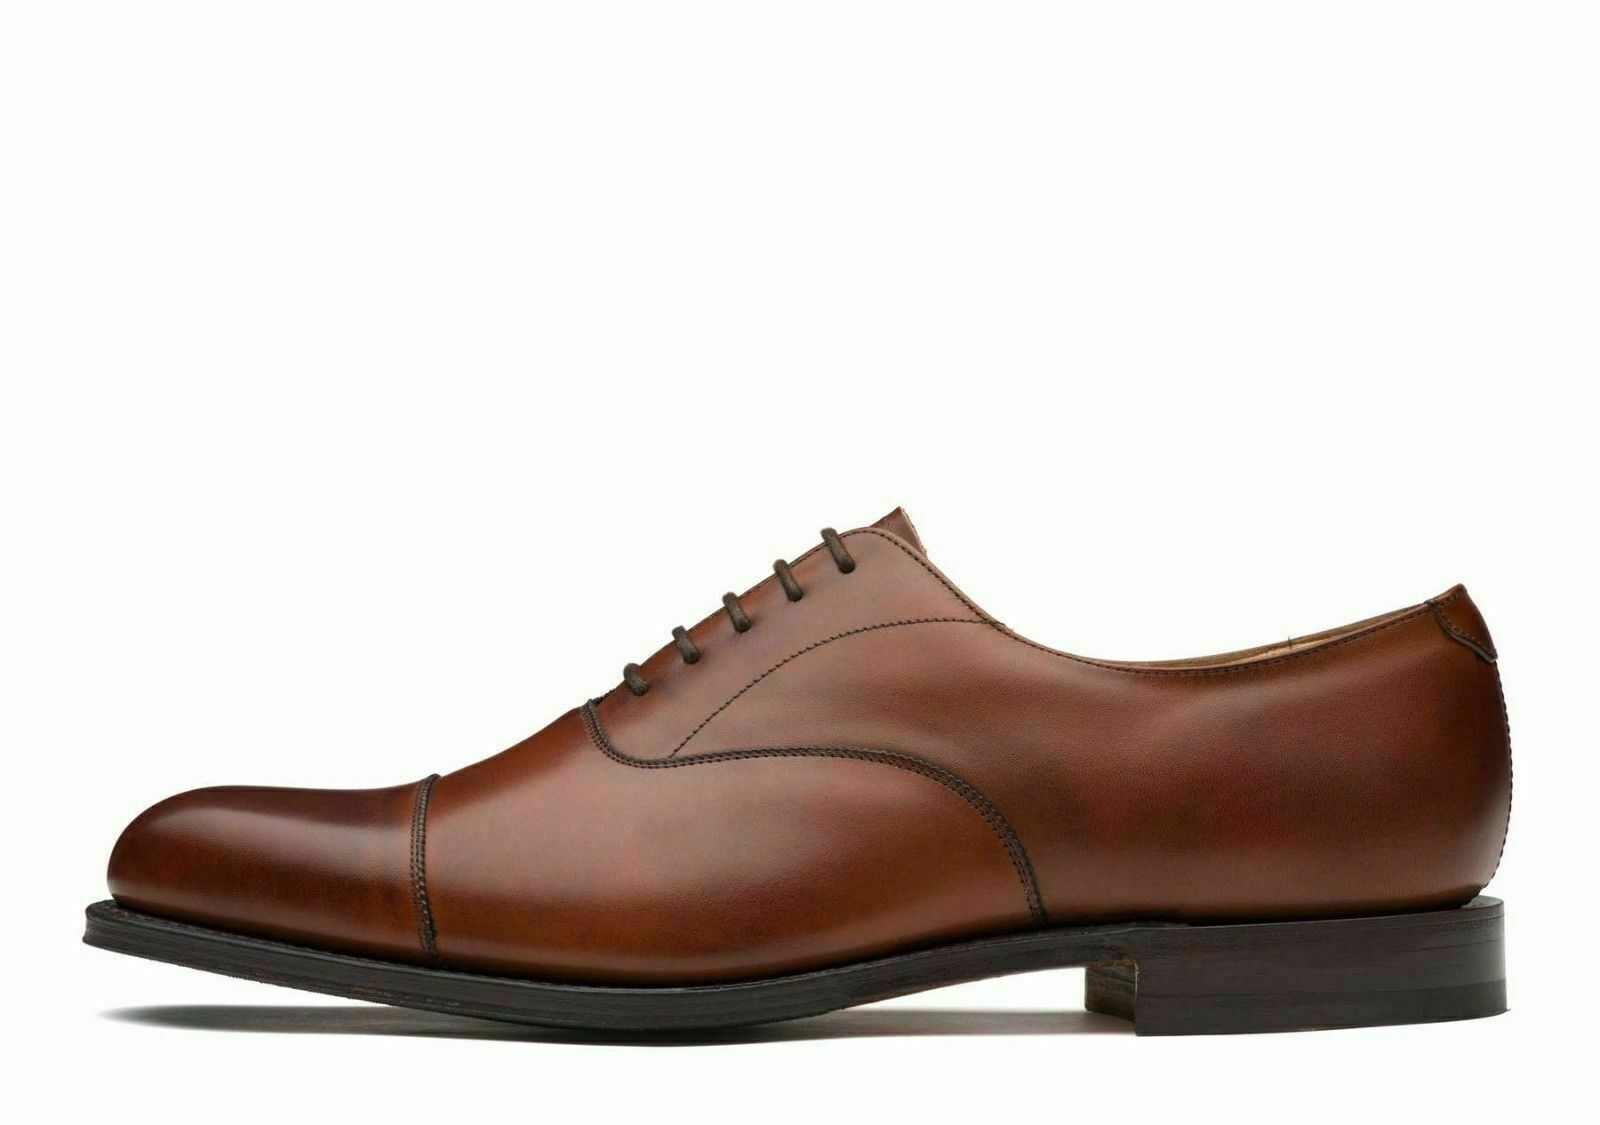 Handgemachte echte braune Leder Classic Toe Cap Schnürschuhe